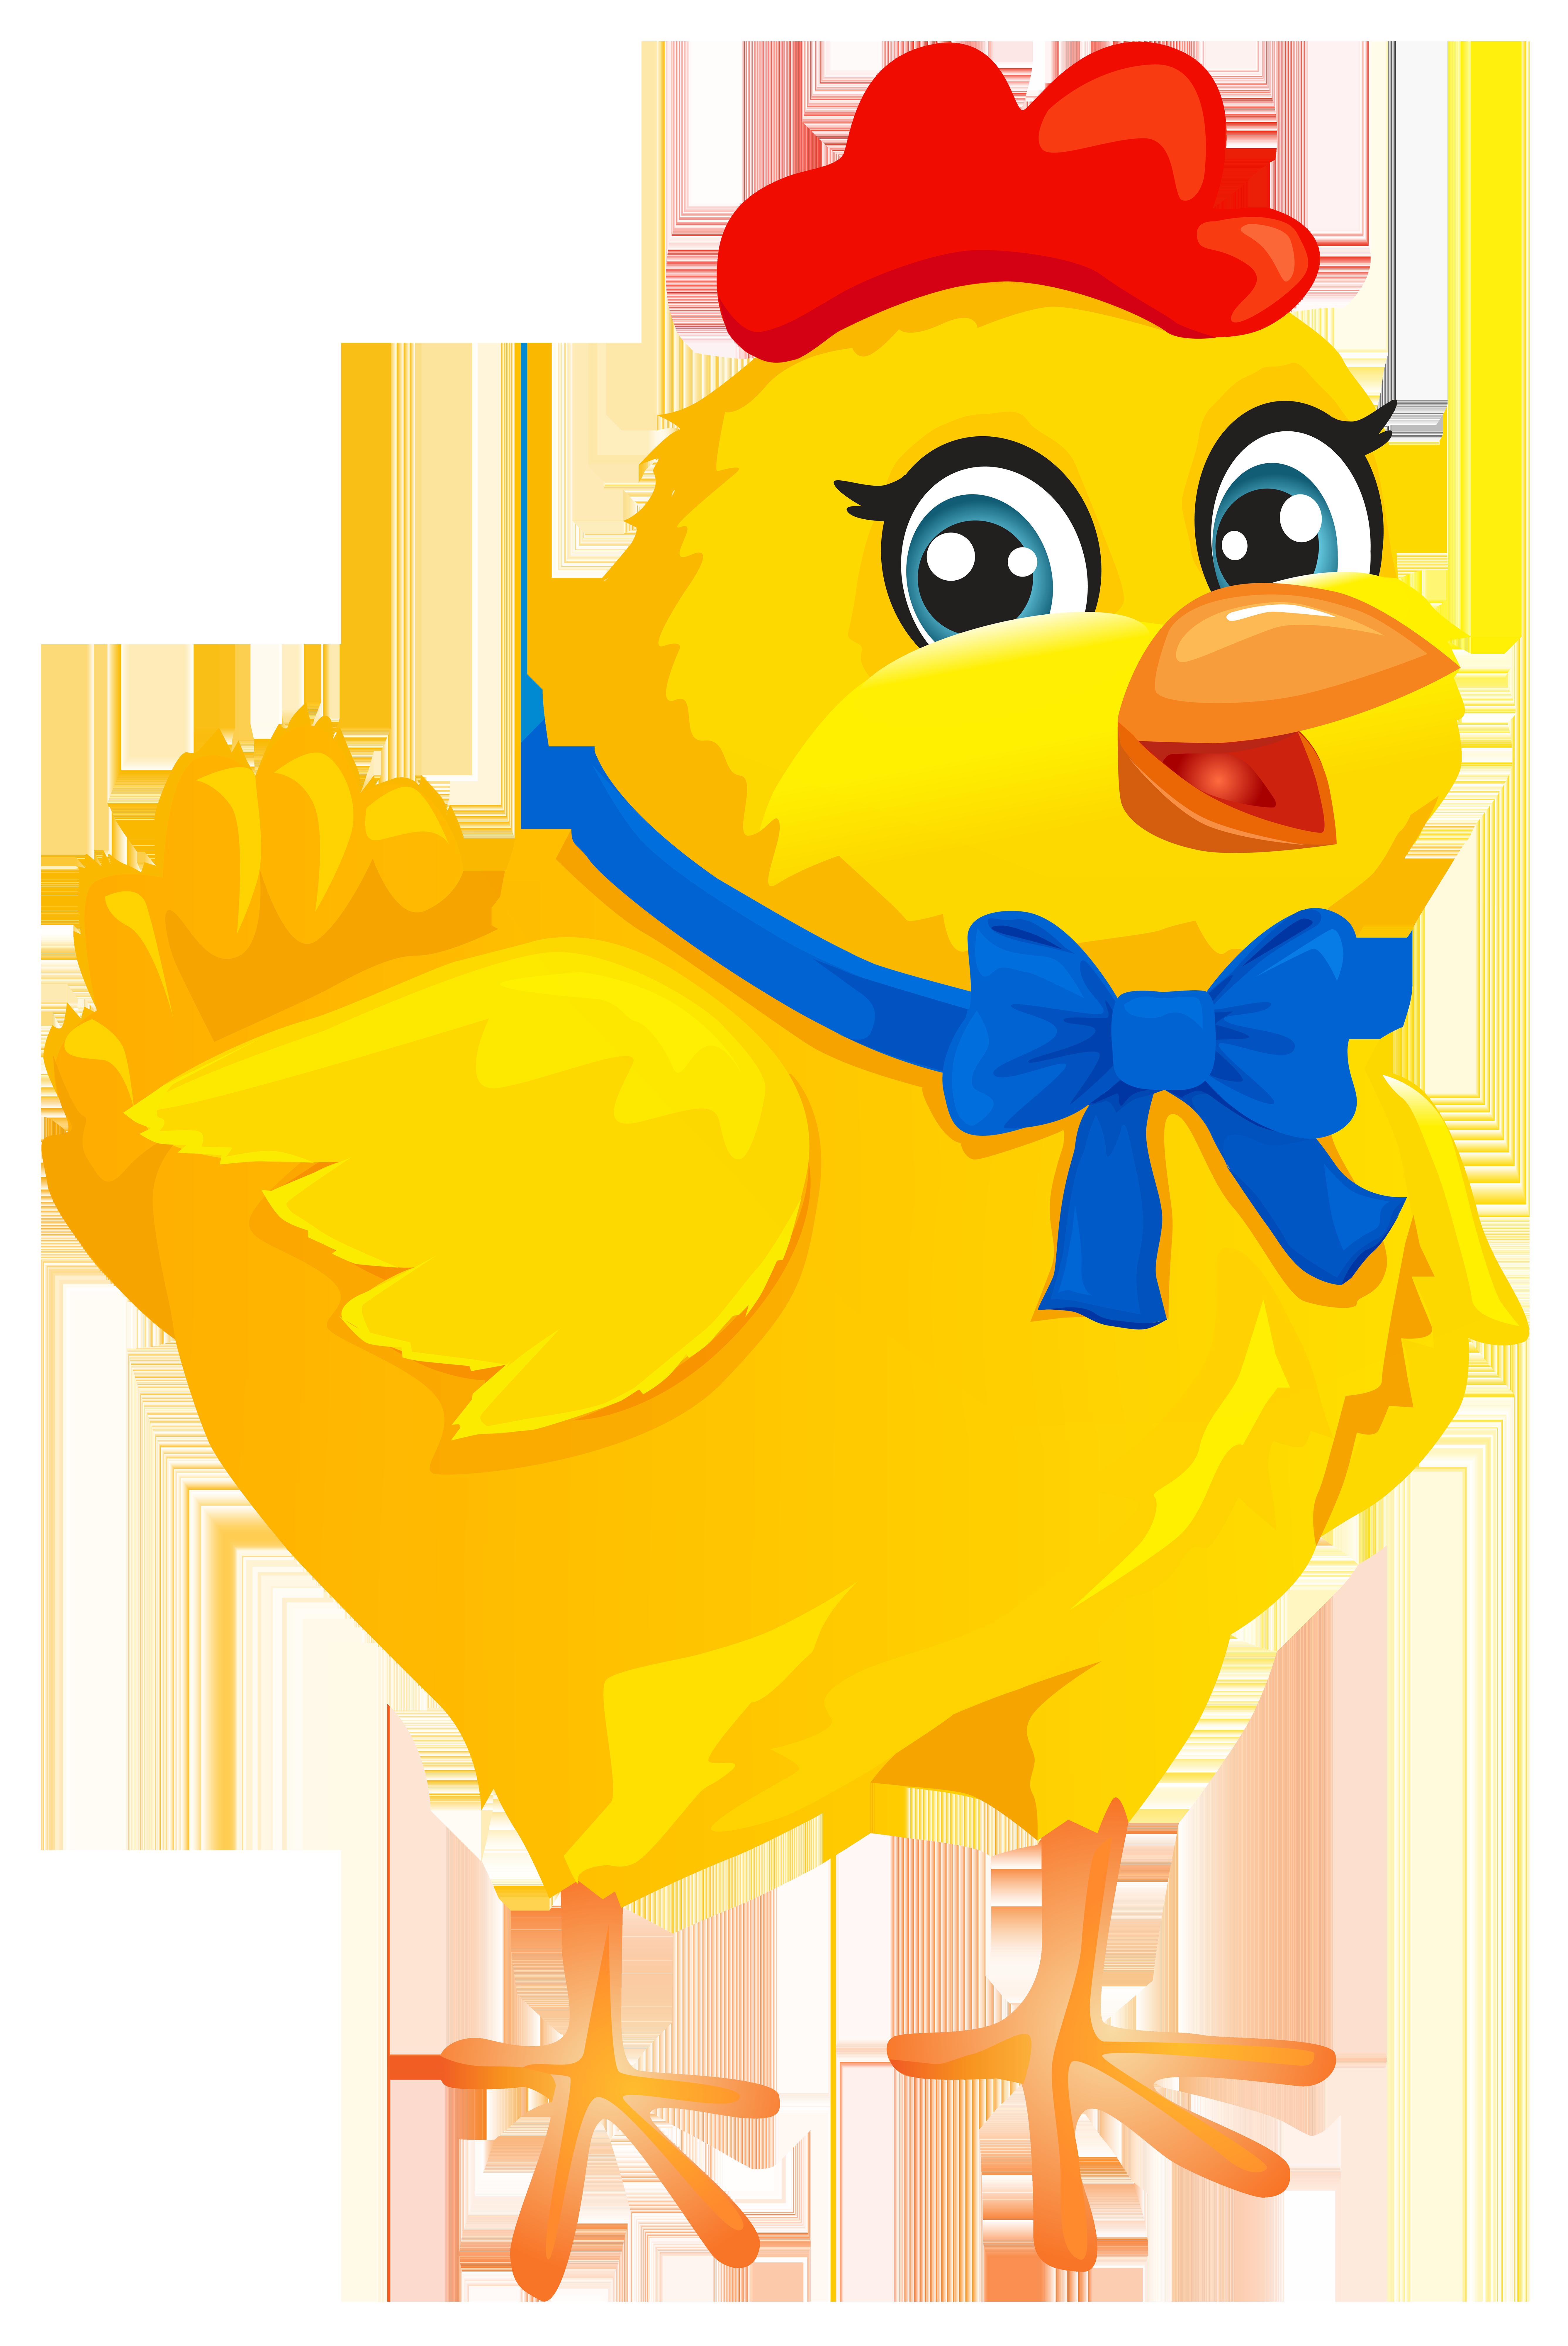 Chicken Easter Kifaranga Clip art.